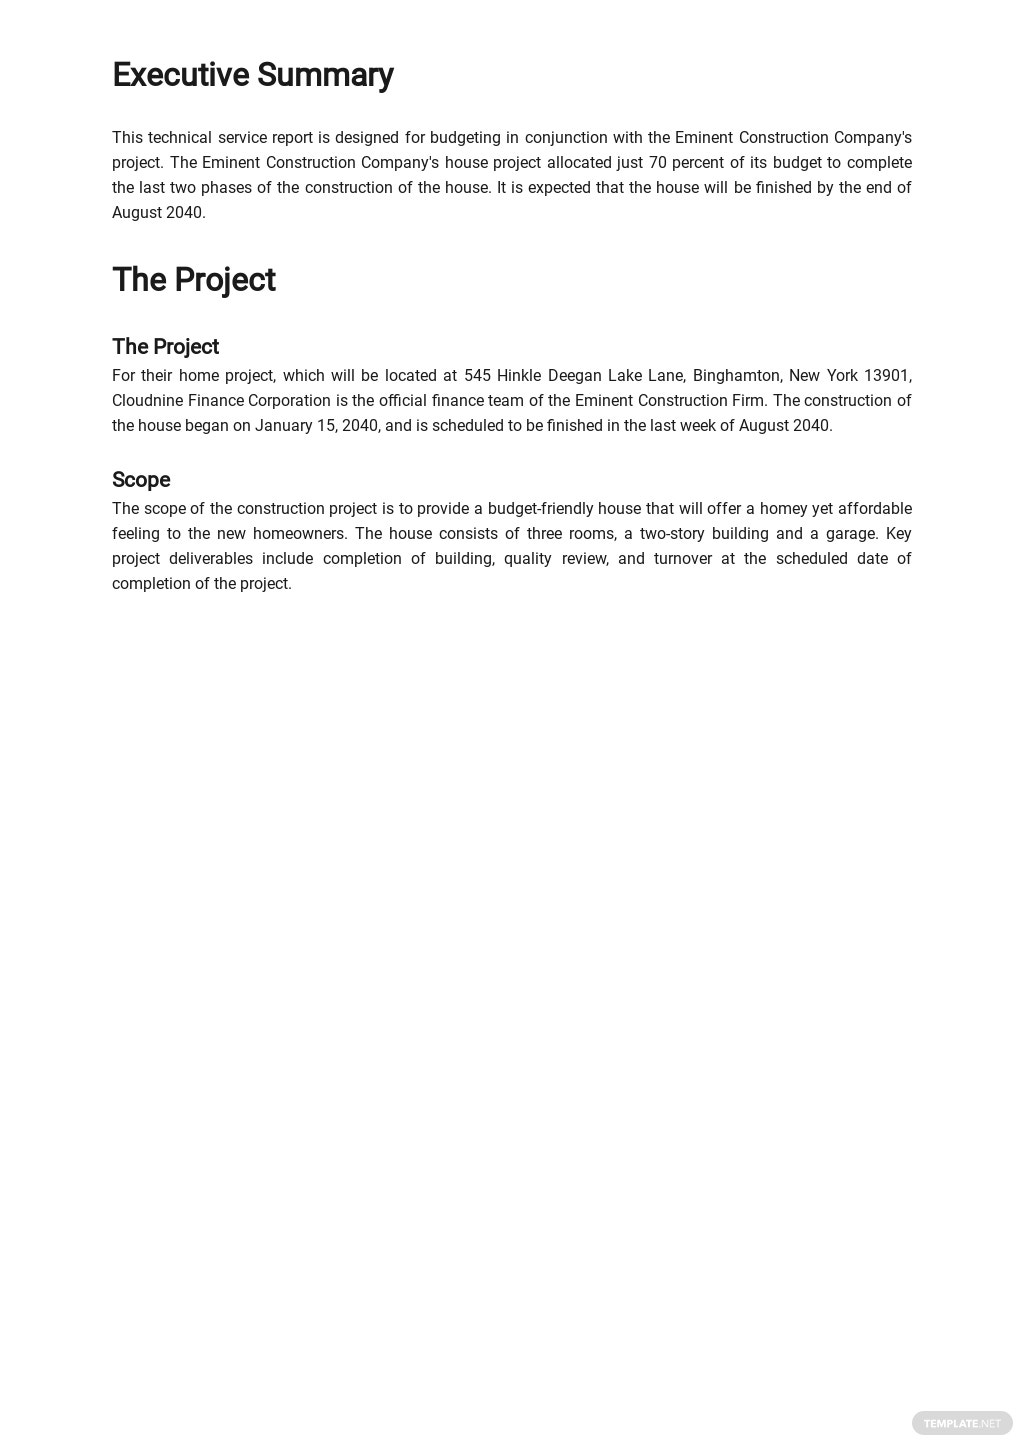 Technical Service Report Template 1.jpe